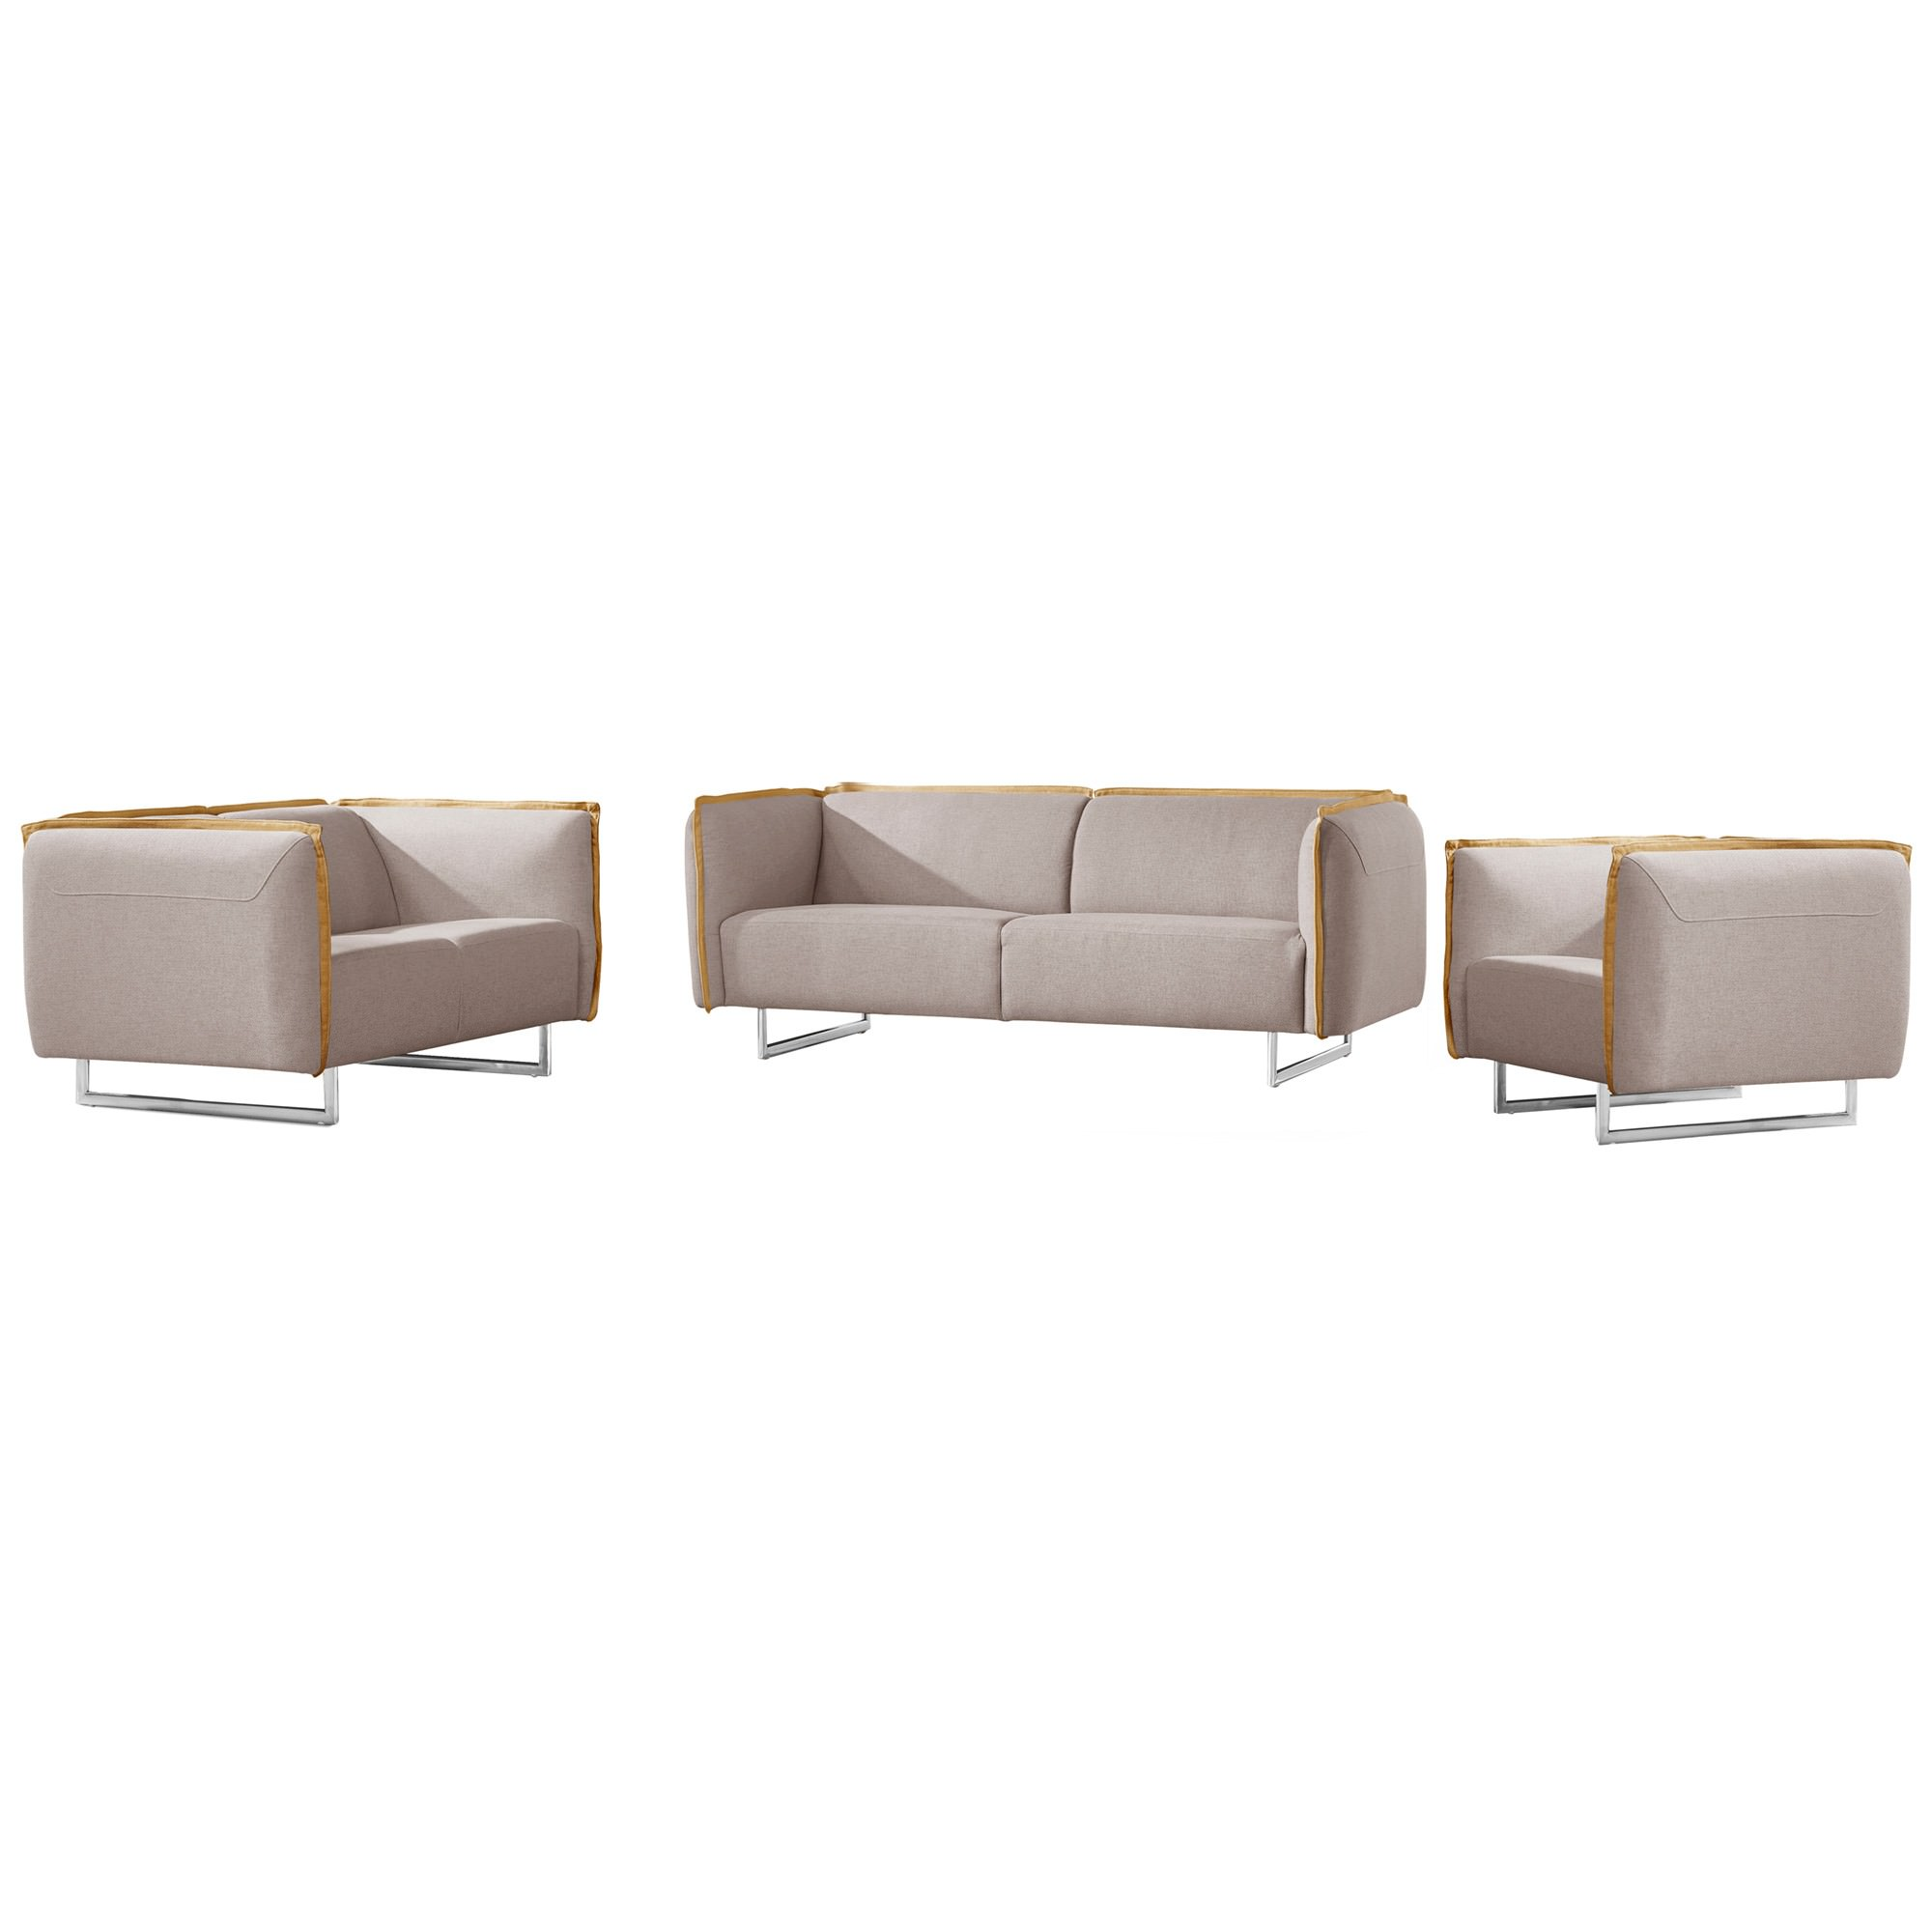 Peyton 3 Piece Fabric Sofa Set, 3+2+1 Seater, Light Grey